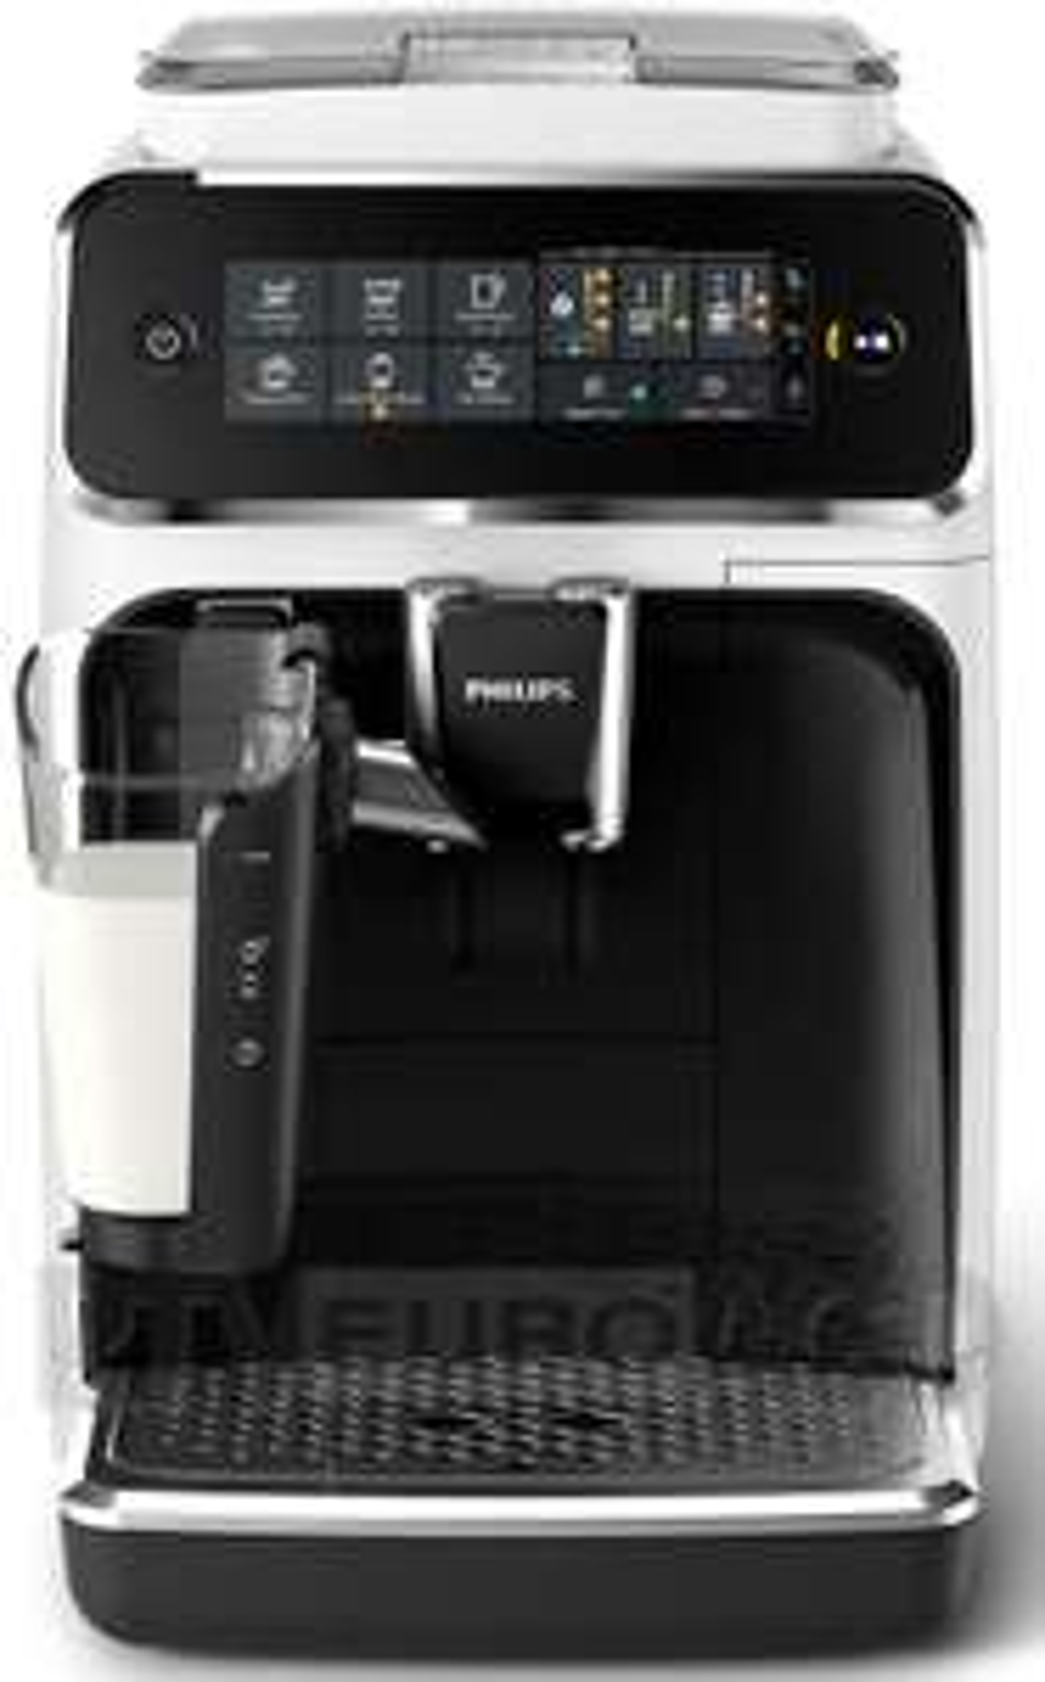 Ekspres Philips LatteGo Premium EP3243/50 (kolor biały) @RTV EURO AGD